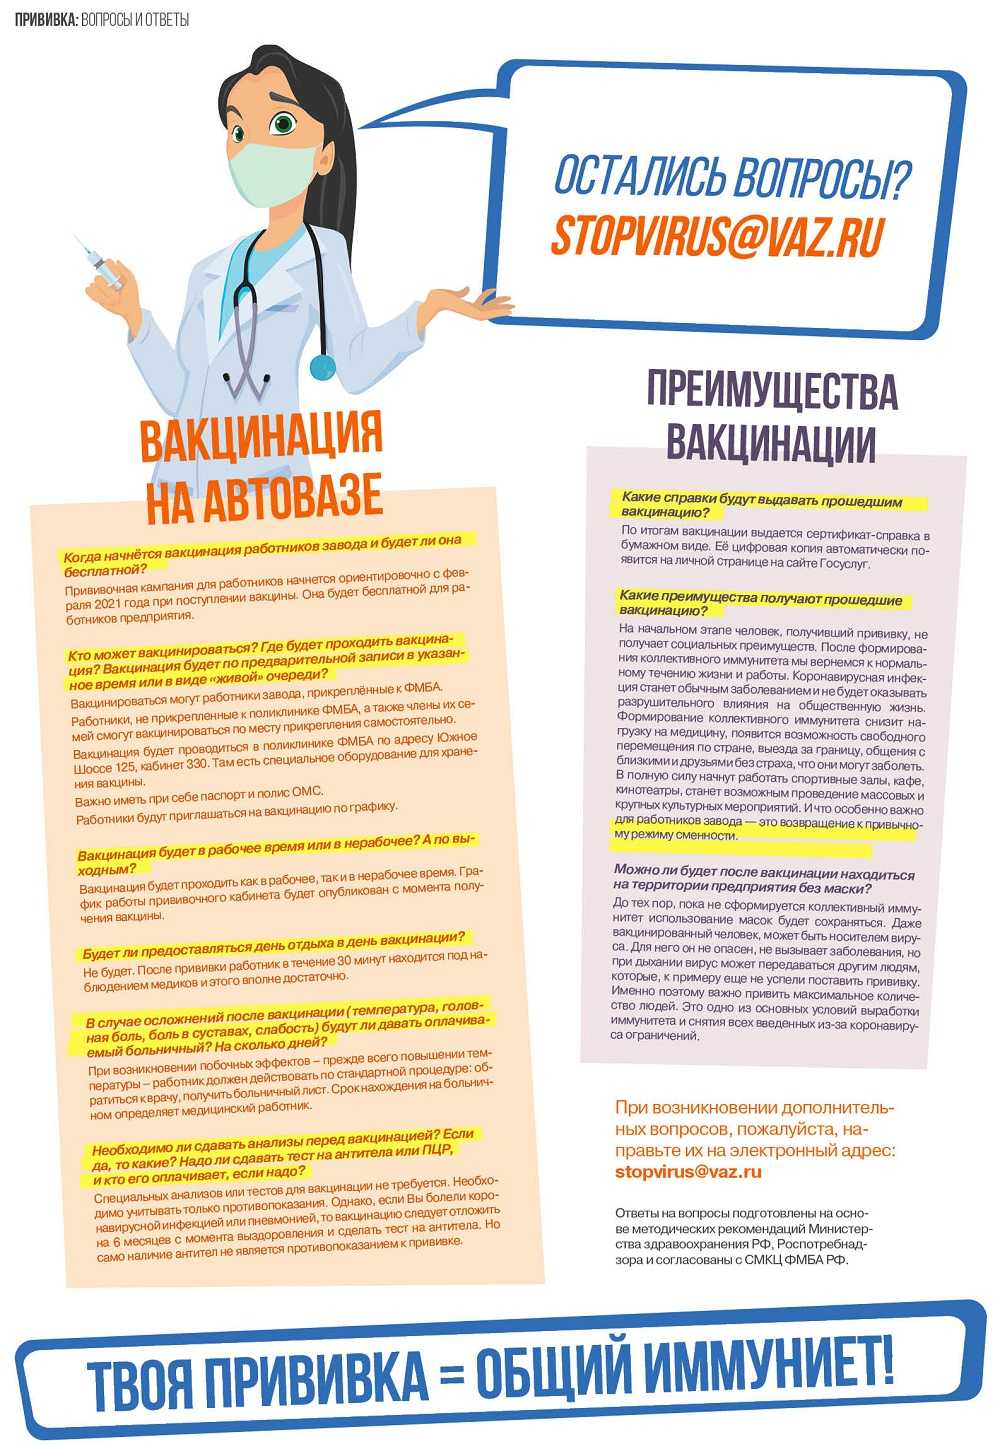 АВТОВАЗ призвал работников к вакцинации от коронавируса